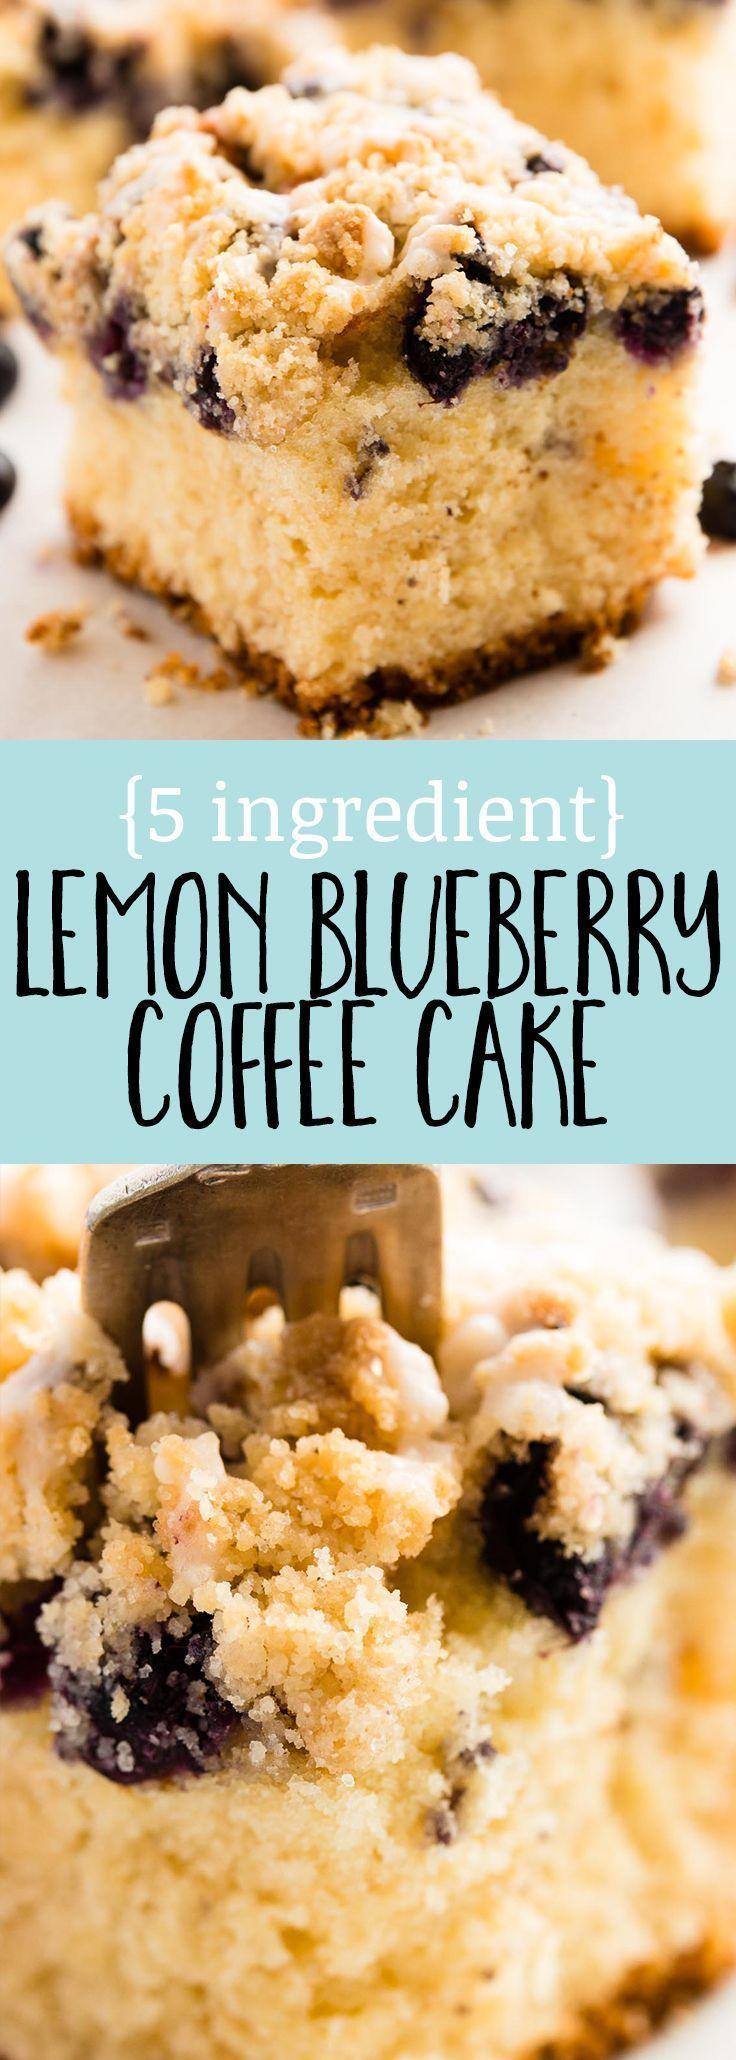 Lemon blueberry sour cream coffee cake the best recipe to